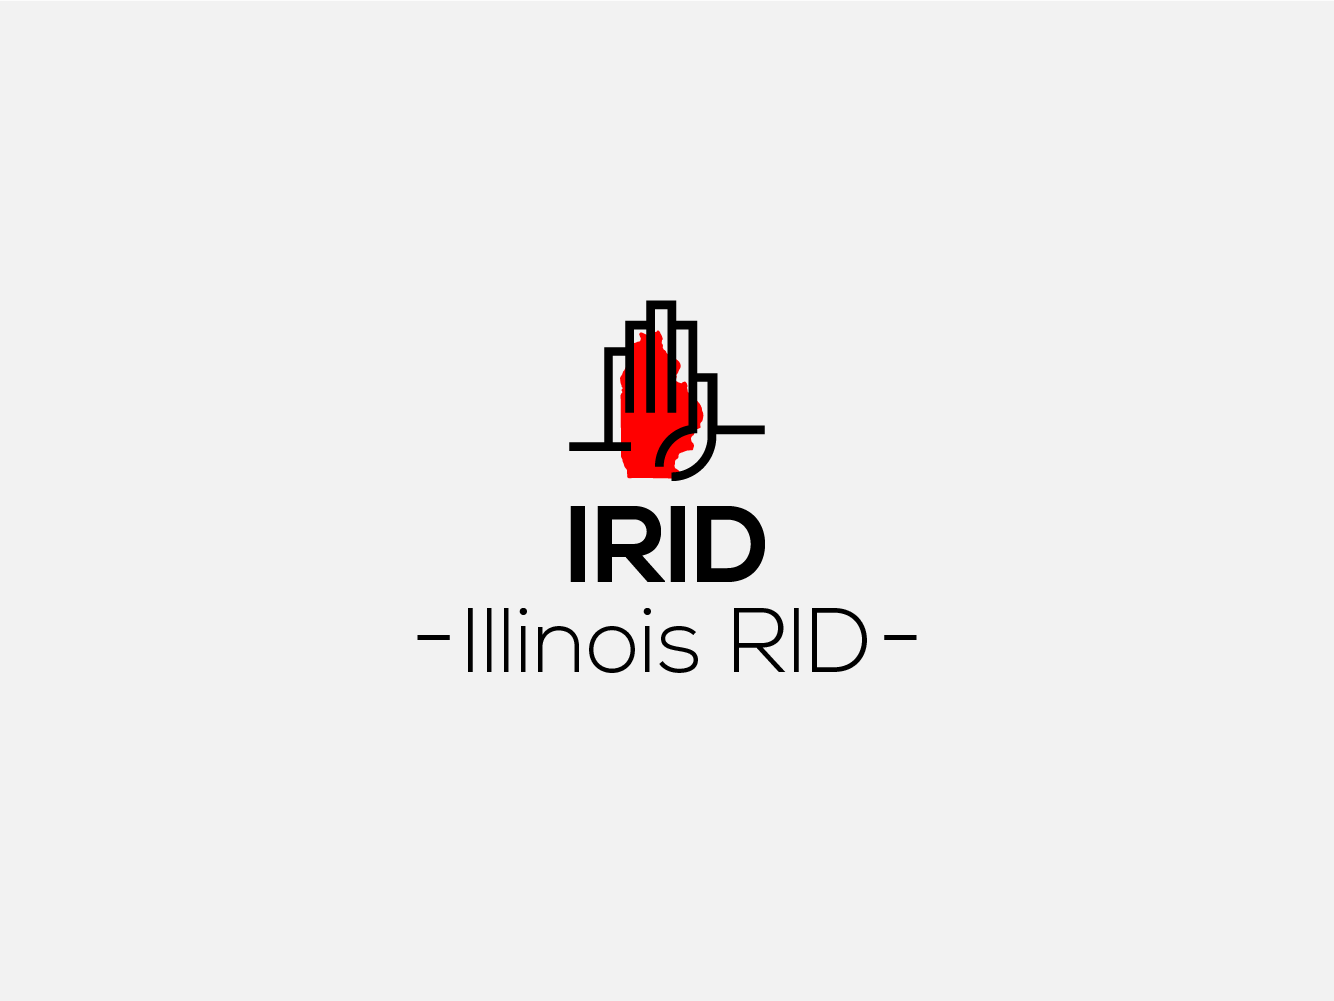 Illinois Rid Branding project logo inspiration letter ux app lettermark sumesh animation flat artission icon bold good vector palattecorner illustration typography design logo creative branding